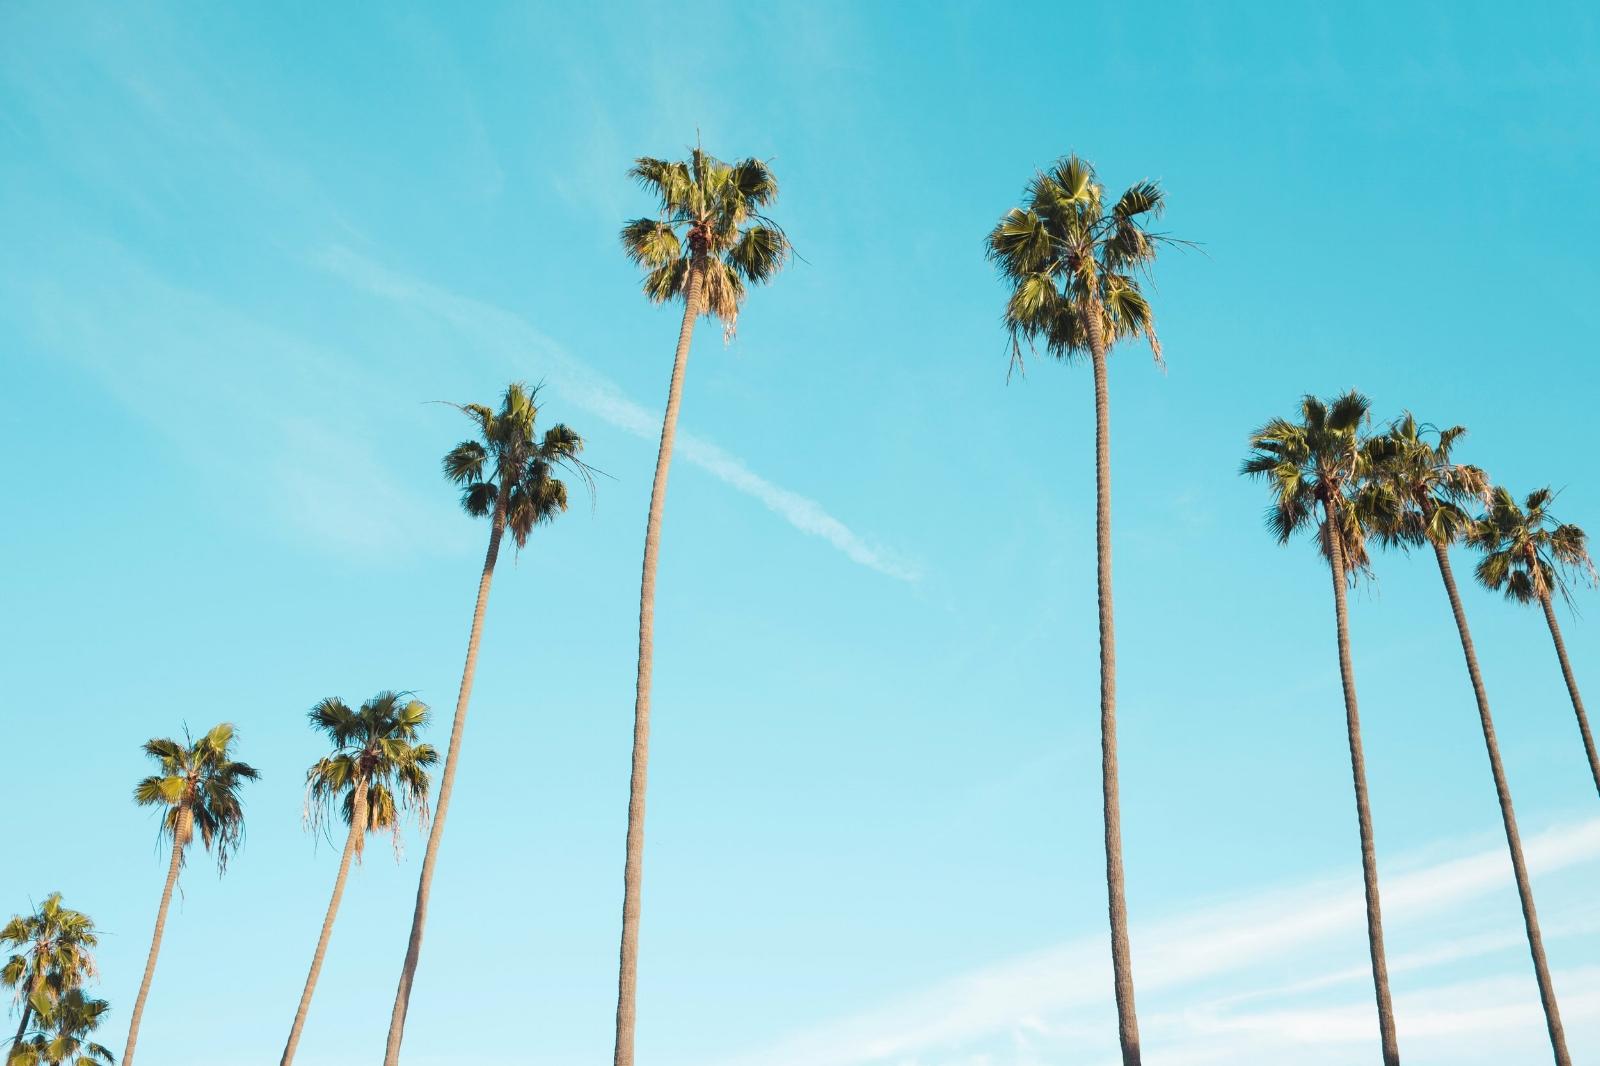 The Media Palm Homepage - Los Angeles Palm Trees